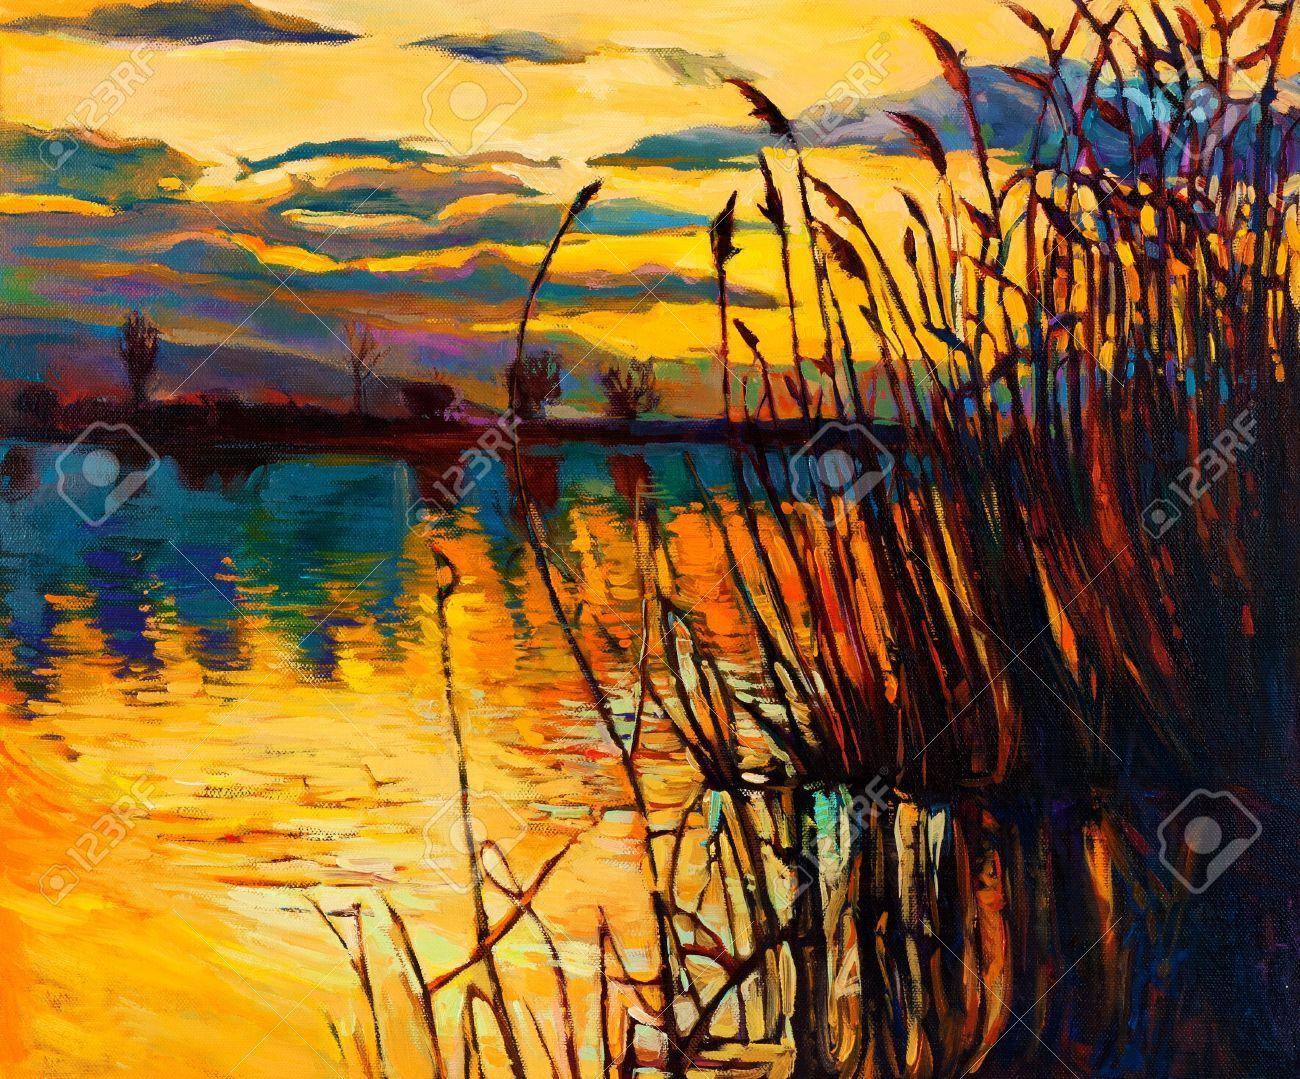 impressionism art landscape - photo #11